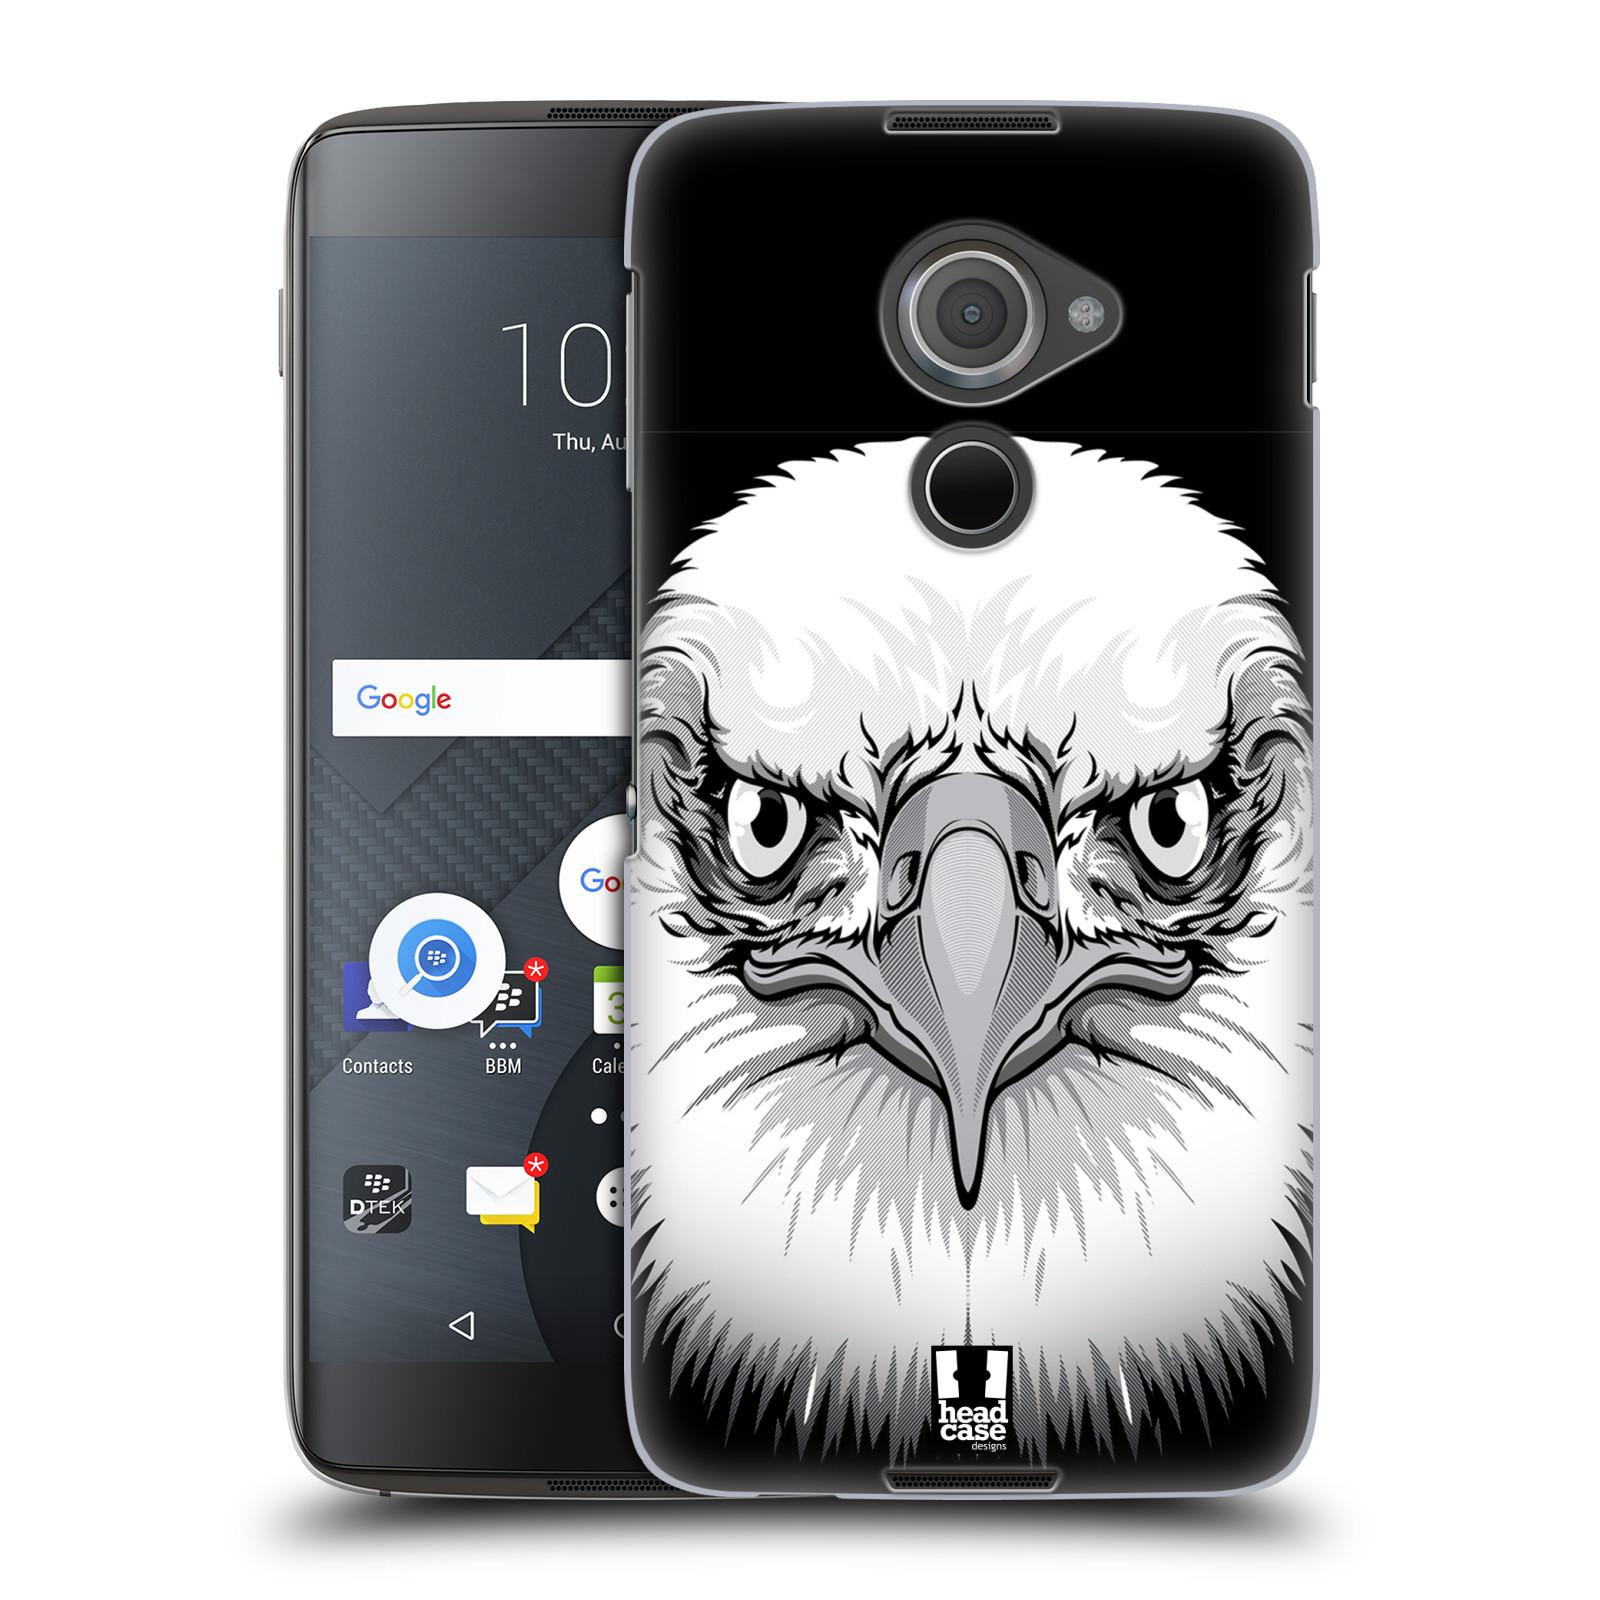 Plastové pouzdro na mobil Blackberry DTEK60 (Argon) - Head Case ILUSTROVANÝ OREL